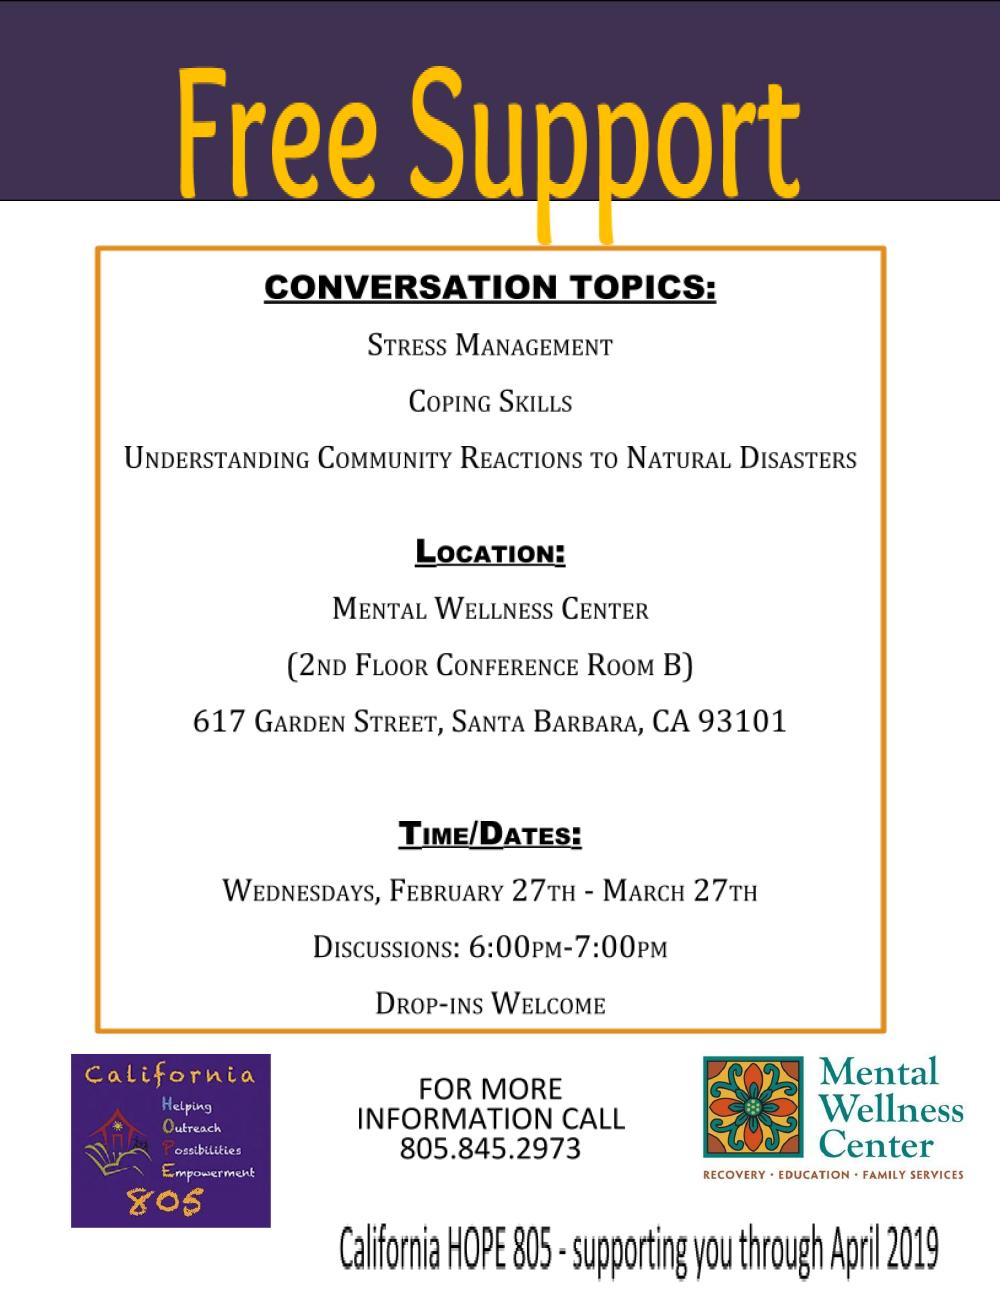 Hope 805 Mental Wellness Center